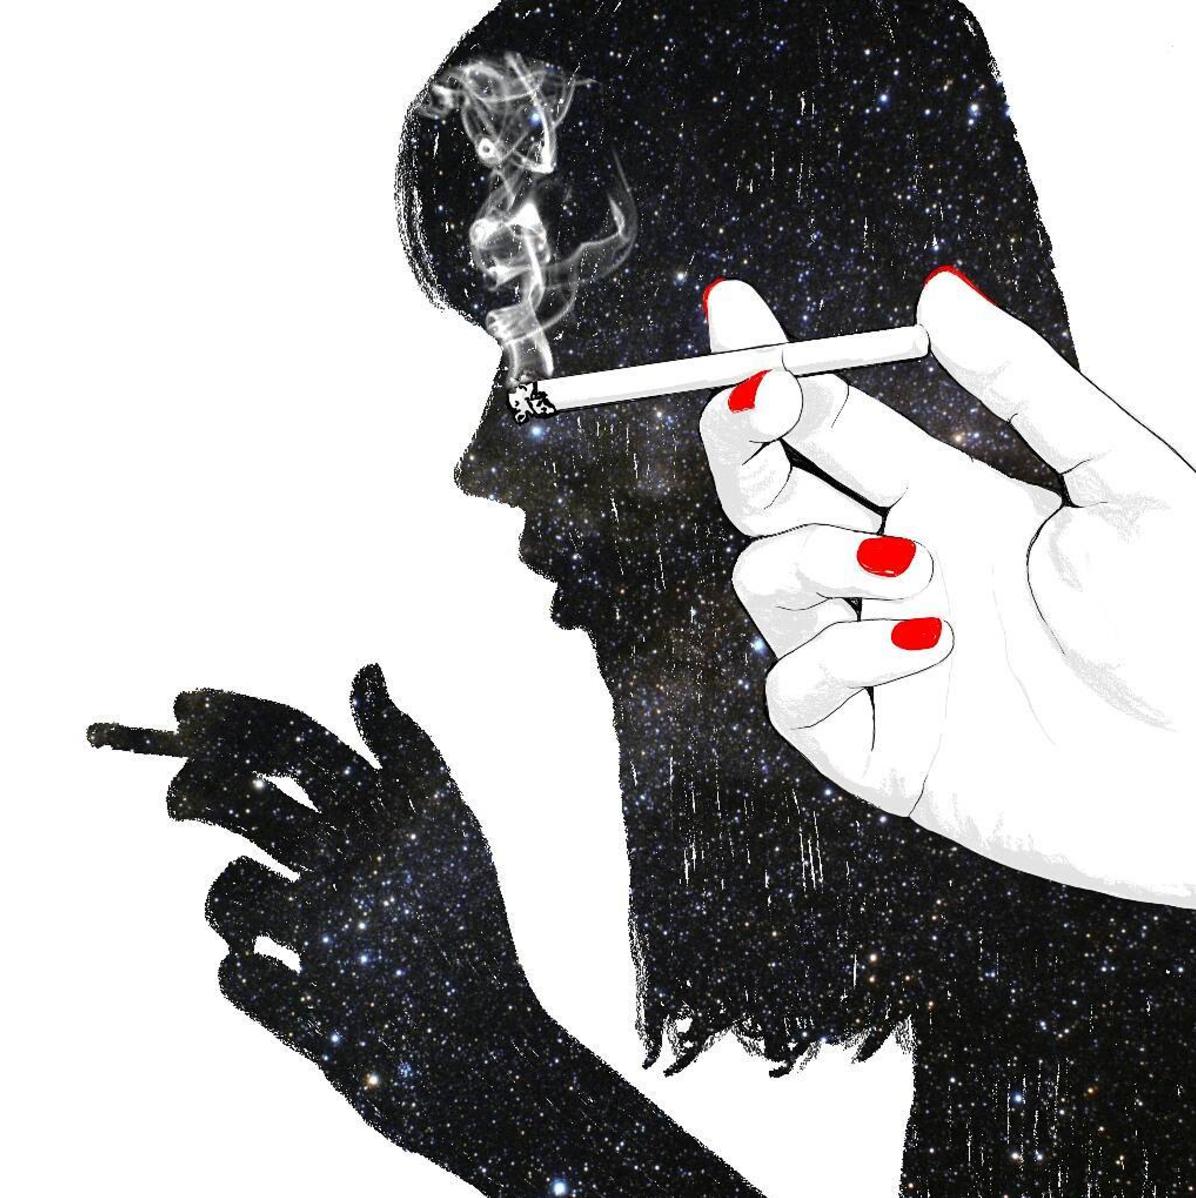 Petite Boheme Illustrations Arte De Humo Ilustraciones